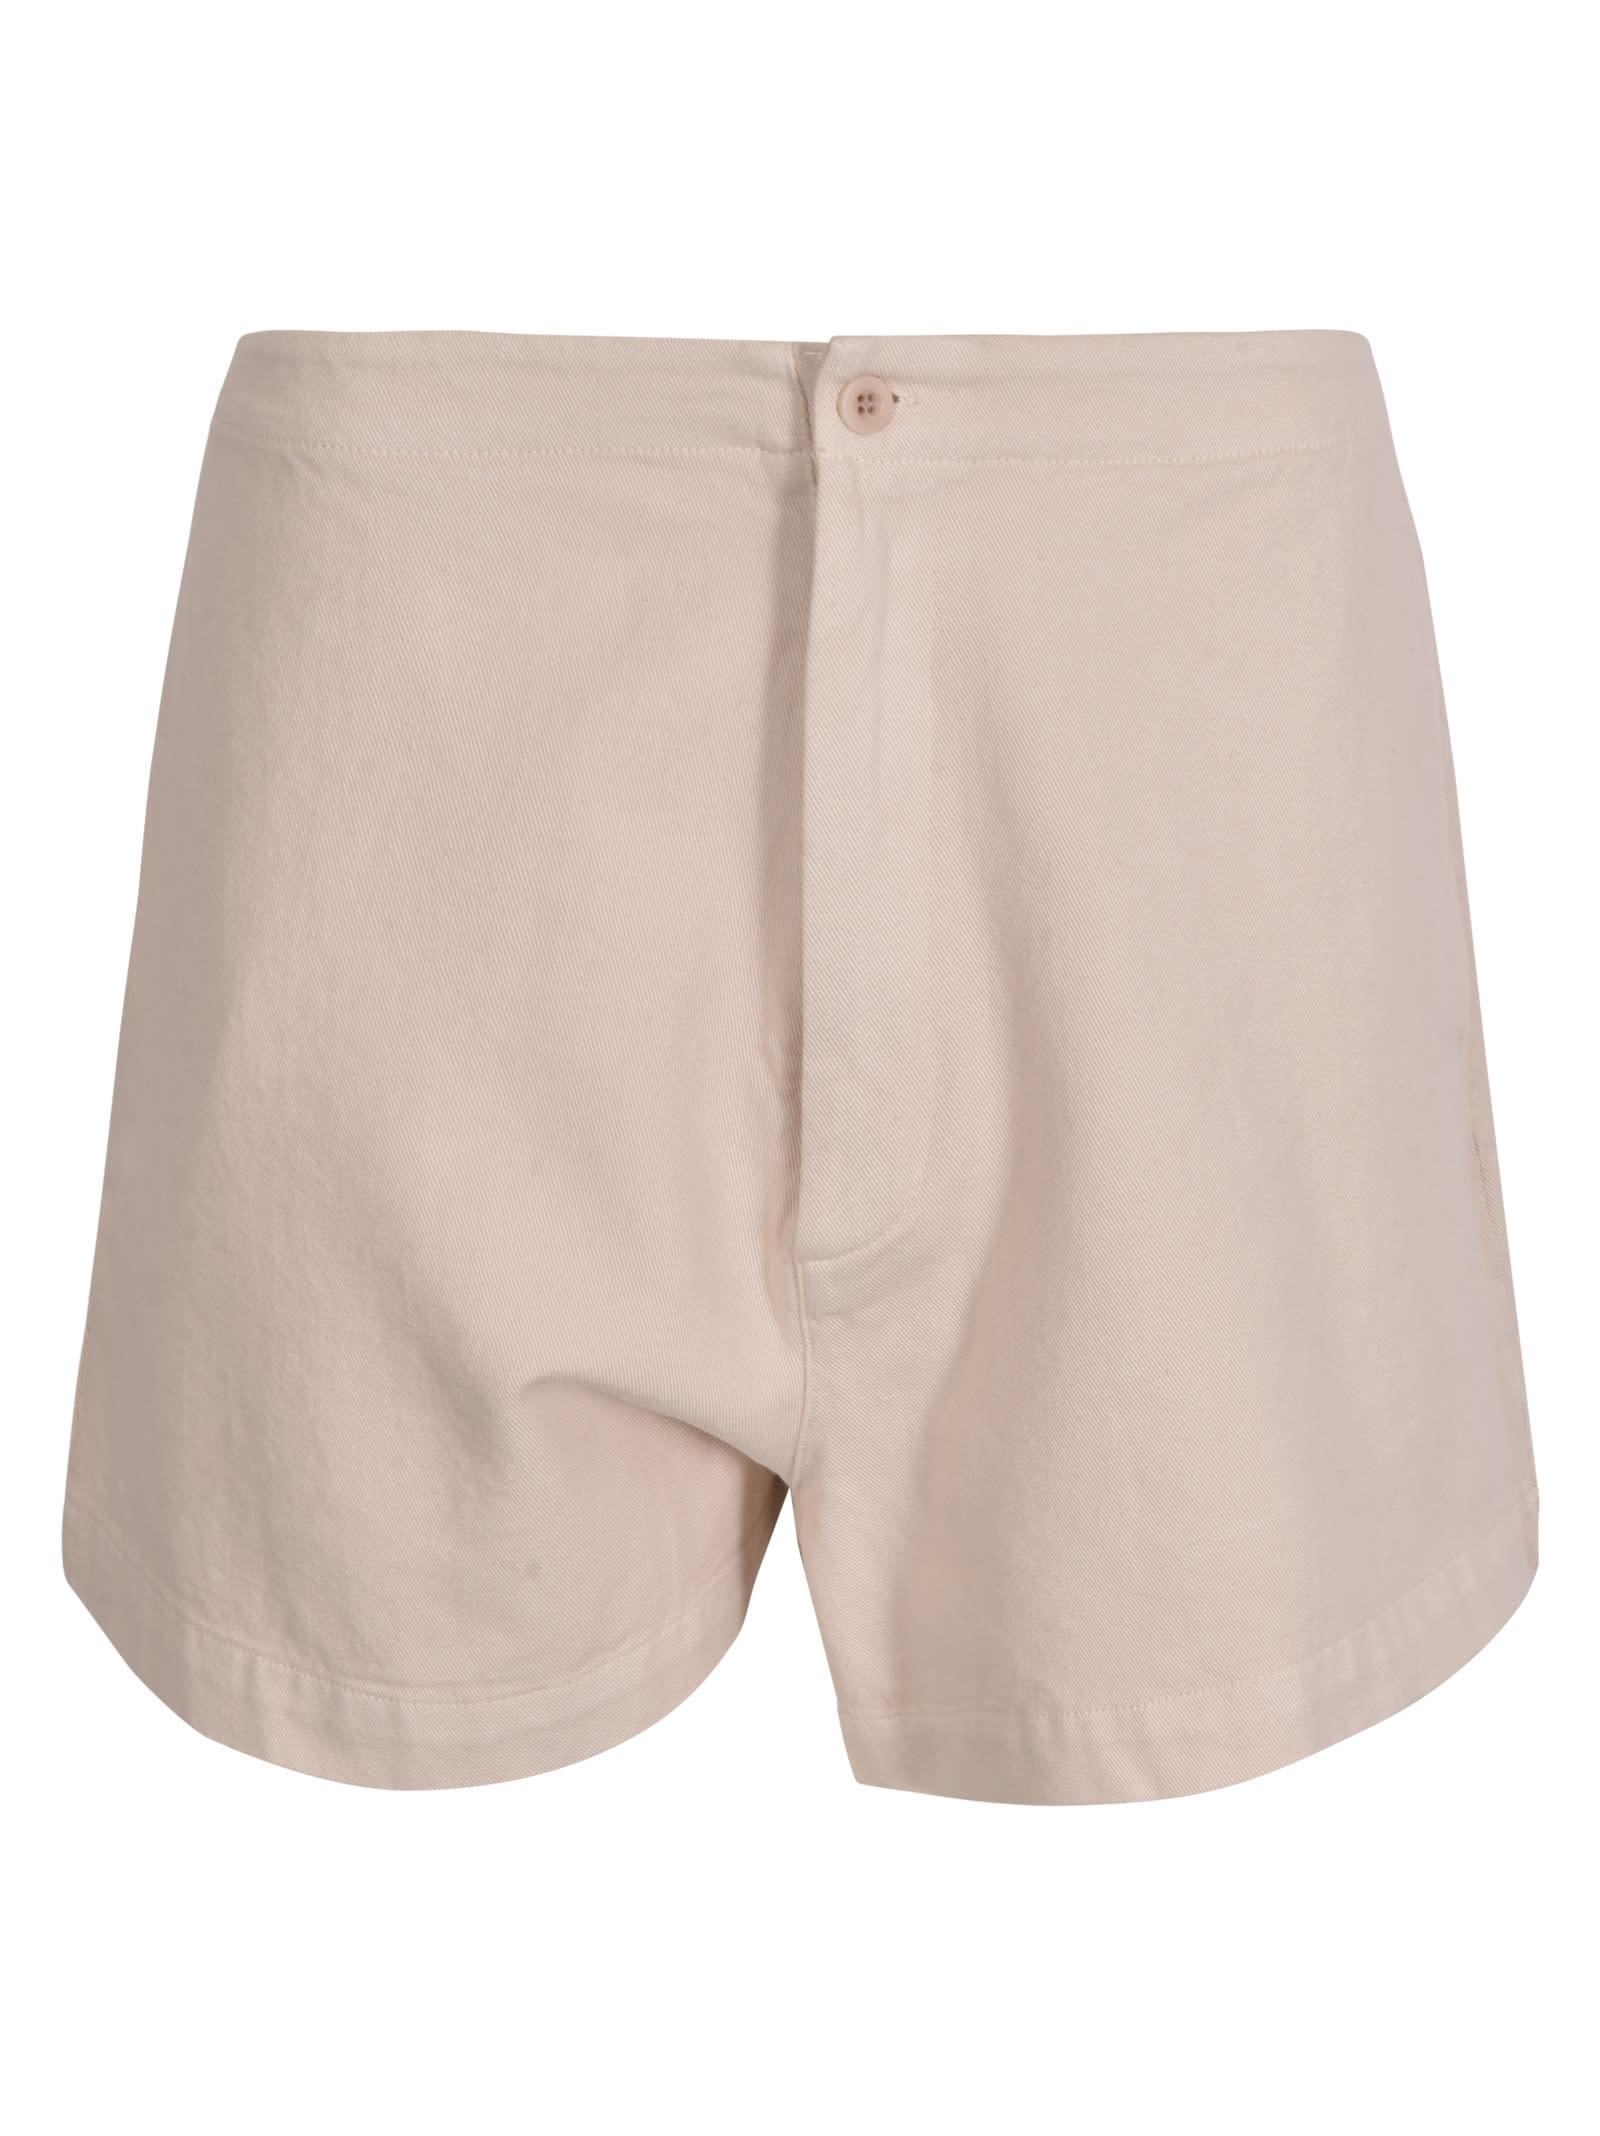 Labo. Art Classic Buttoned Shorts